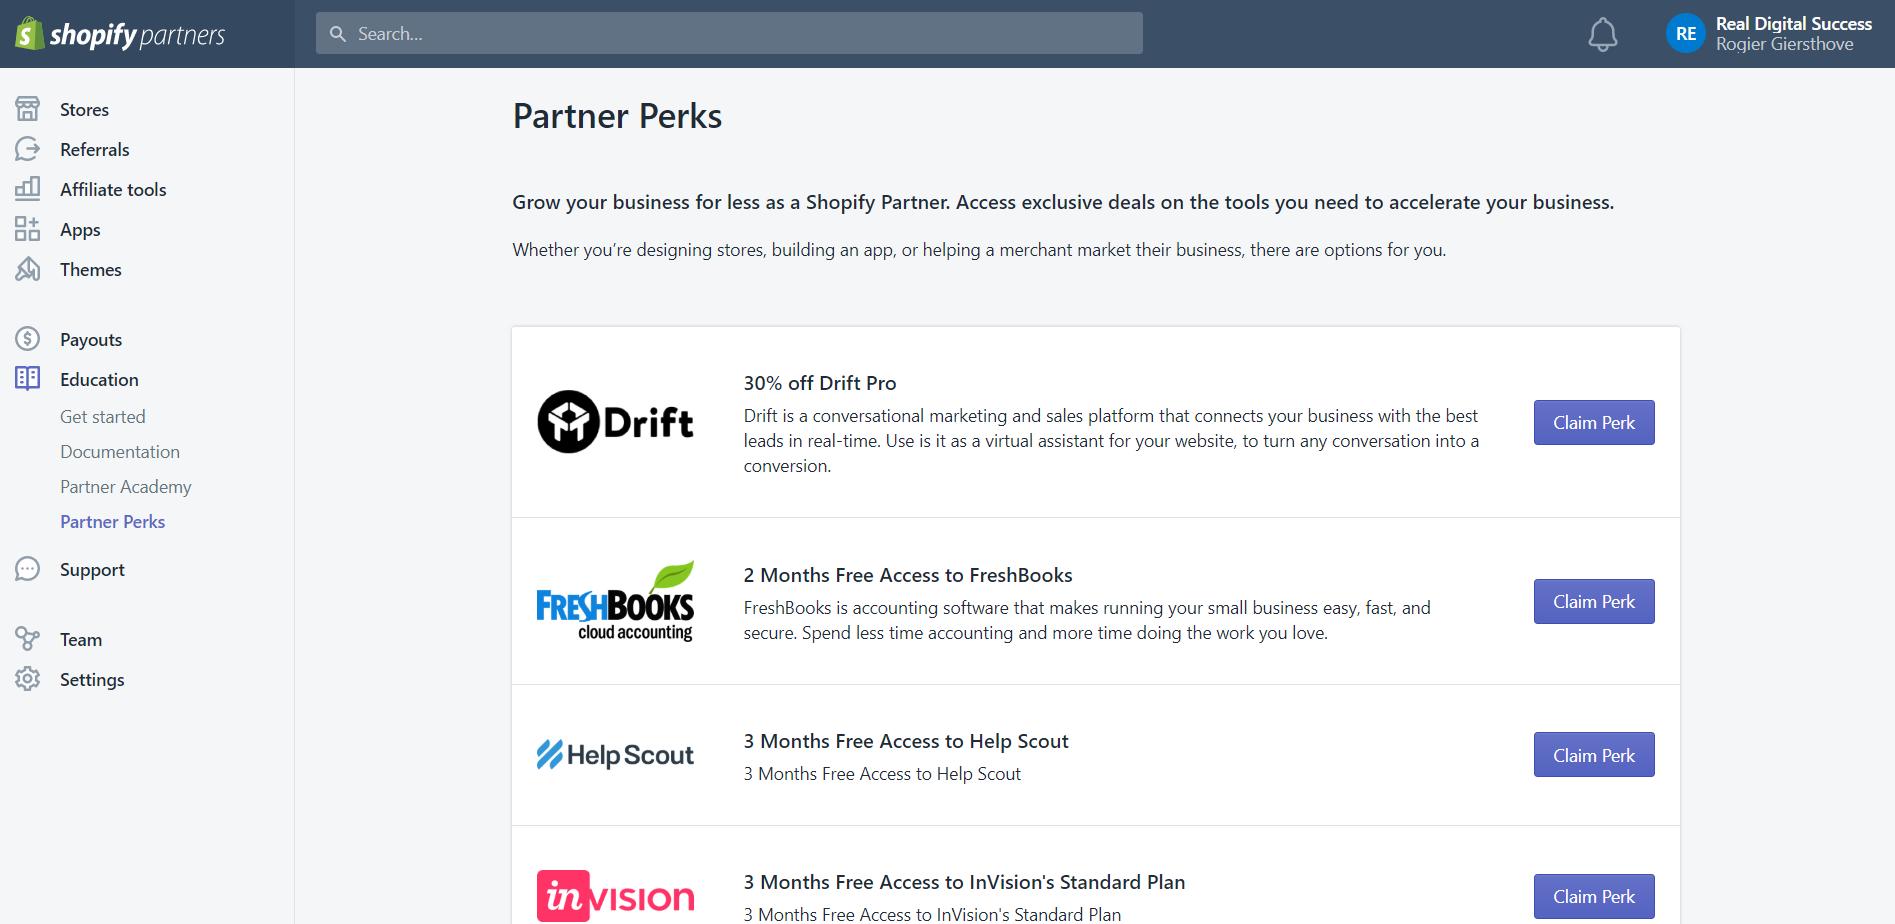 Shopify Partner Perks